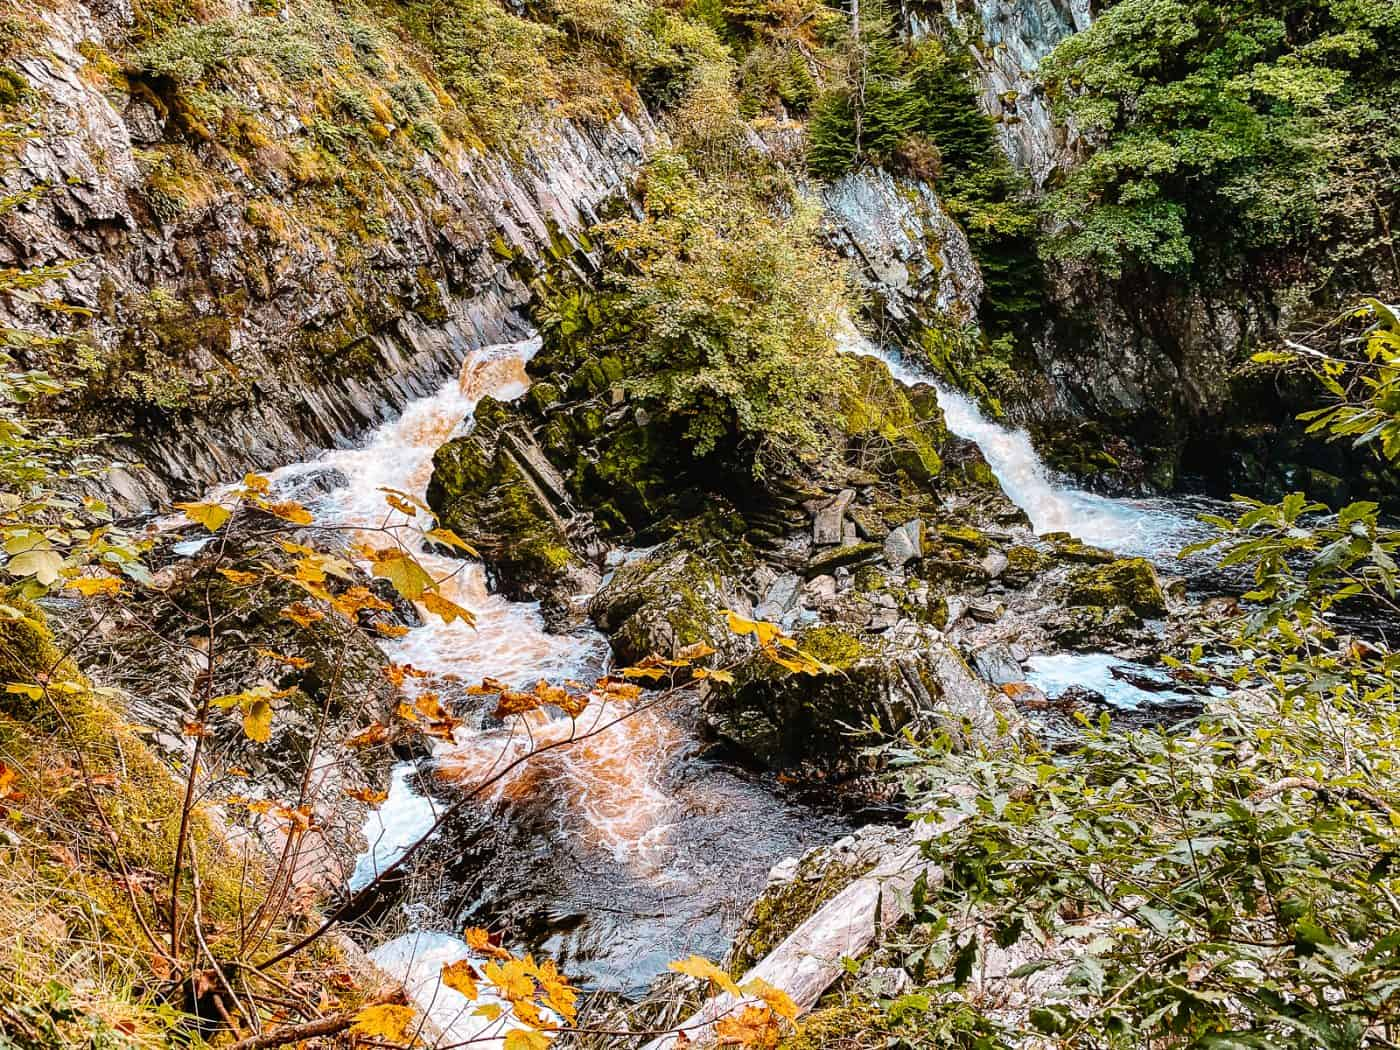 Conwy Falls Cafe Walk Waterfall Snowdonia Wales